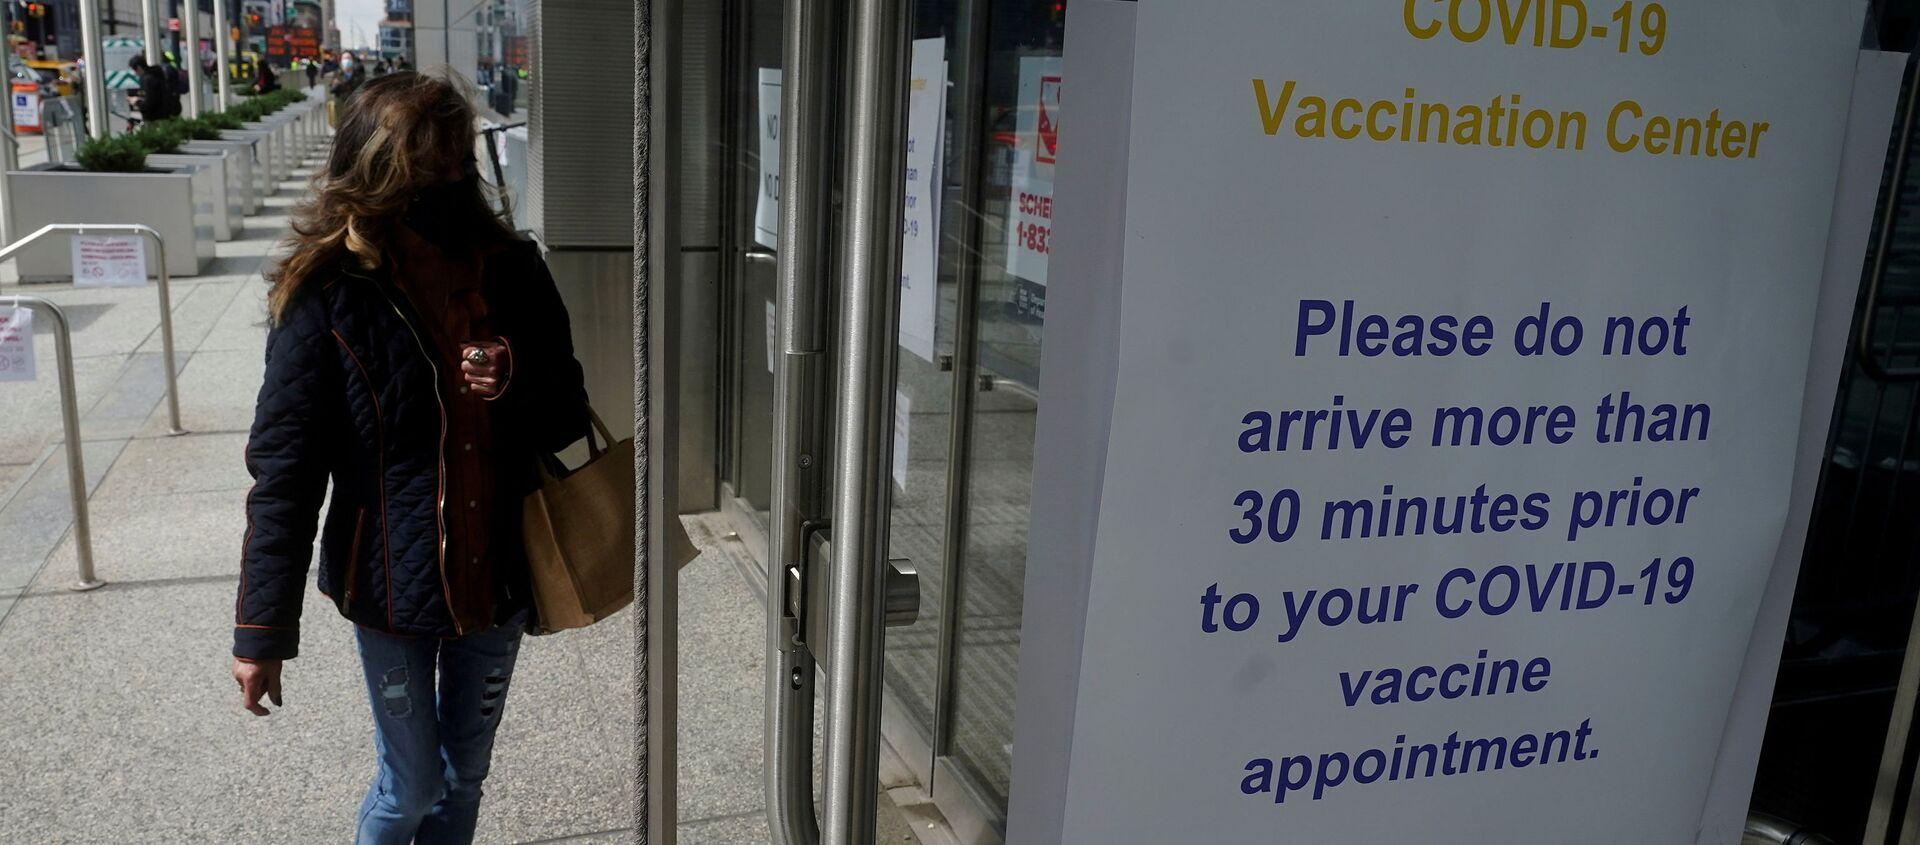 People arrive at the Javits Center mass vaccination location amid the coronavirus disease (COVID-19) pandemic in the Manhattan borough of New York City, New York, U.S., April 13, 2021 - Sputnik International, 1920, 26.07.2021